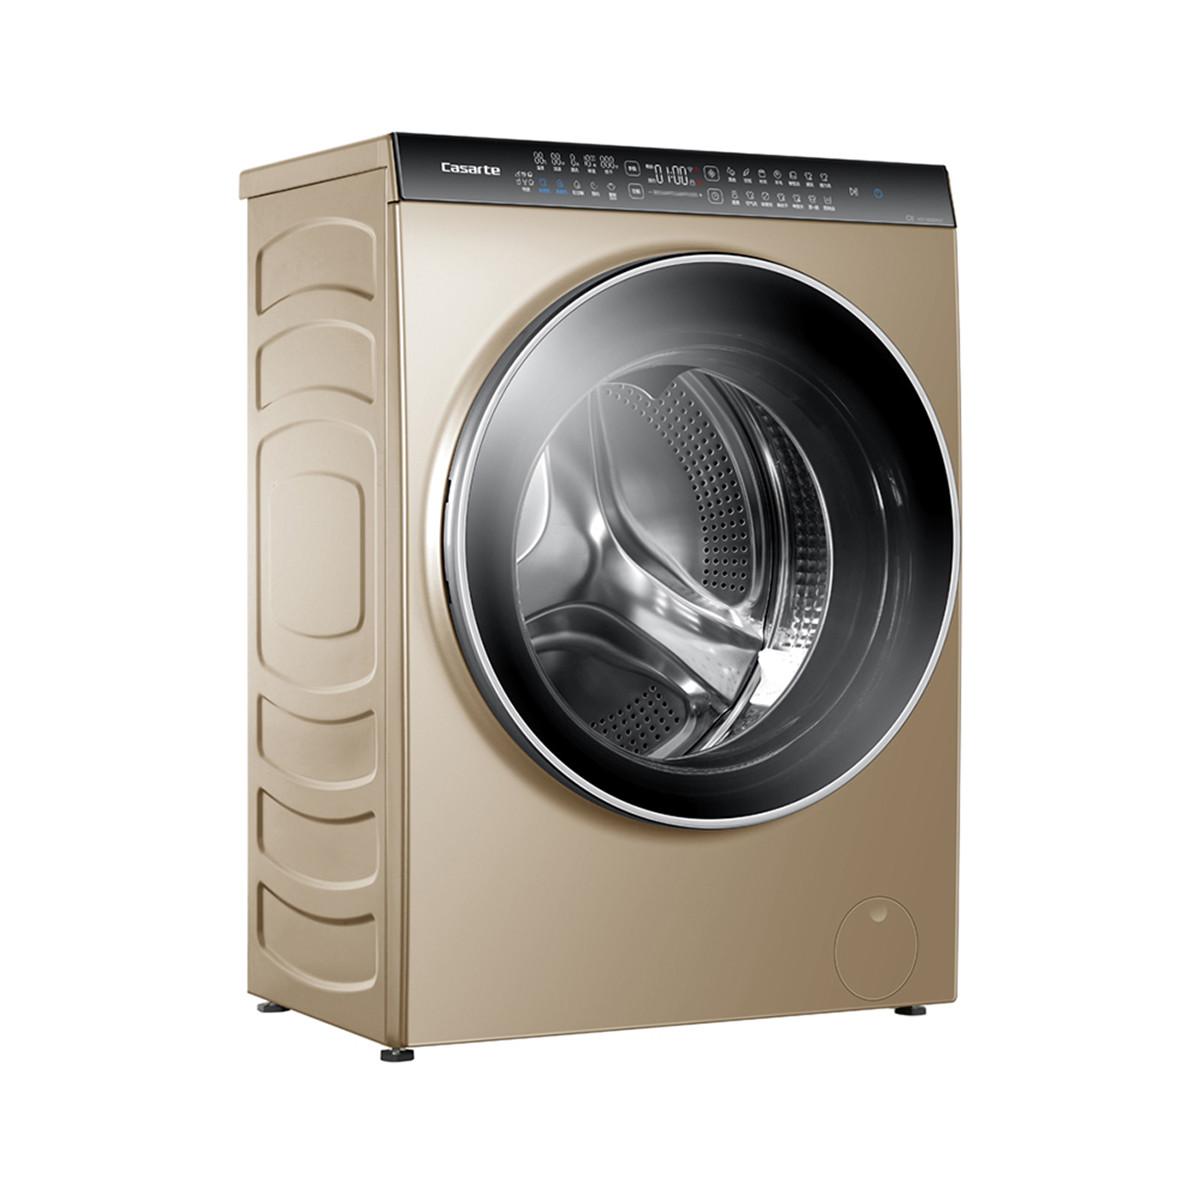 Casarte/卡萨帝                         滚筒洗衣机                         C6 HDR10G6XU1